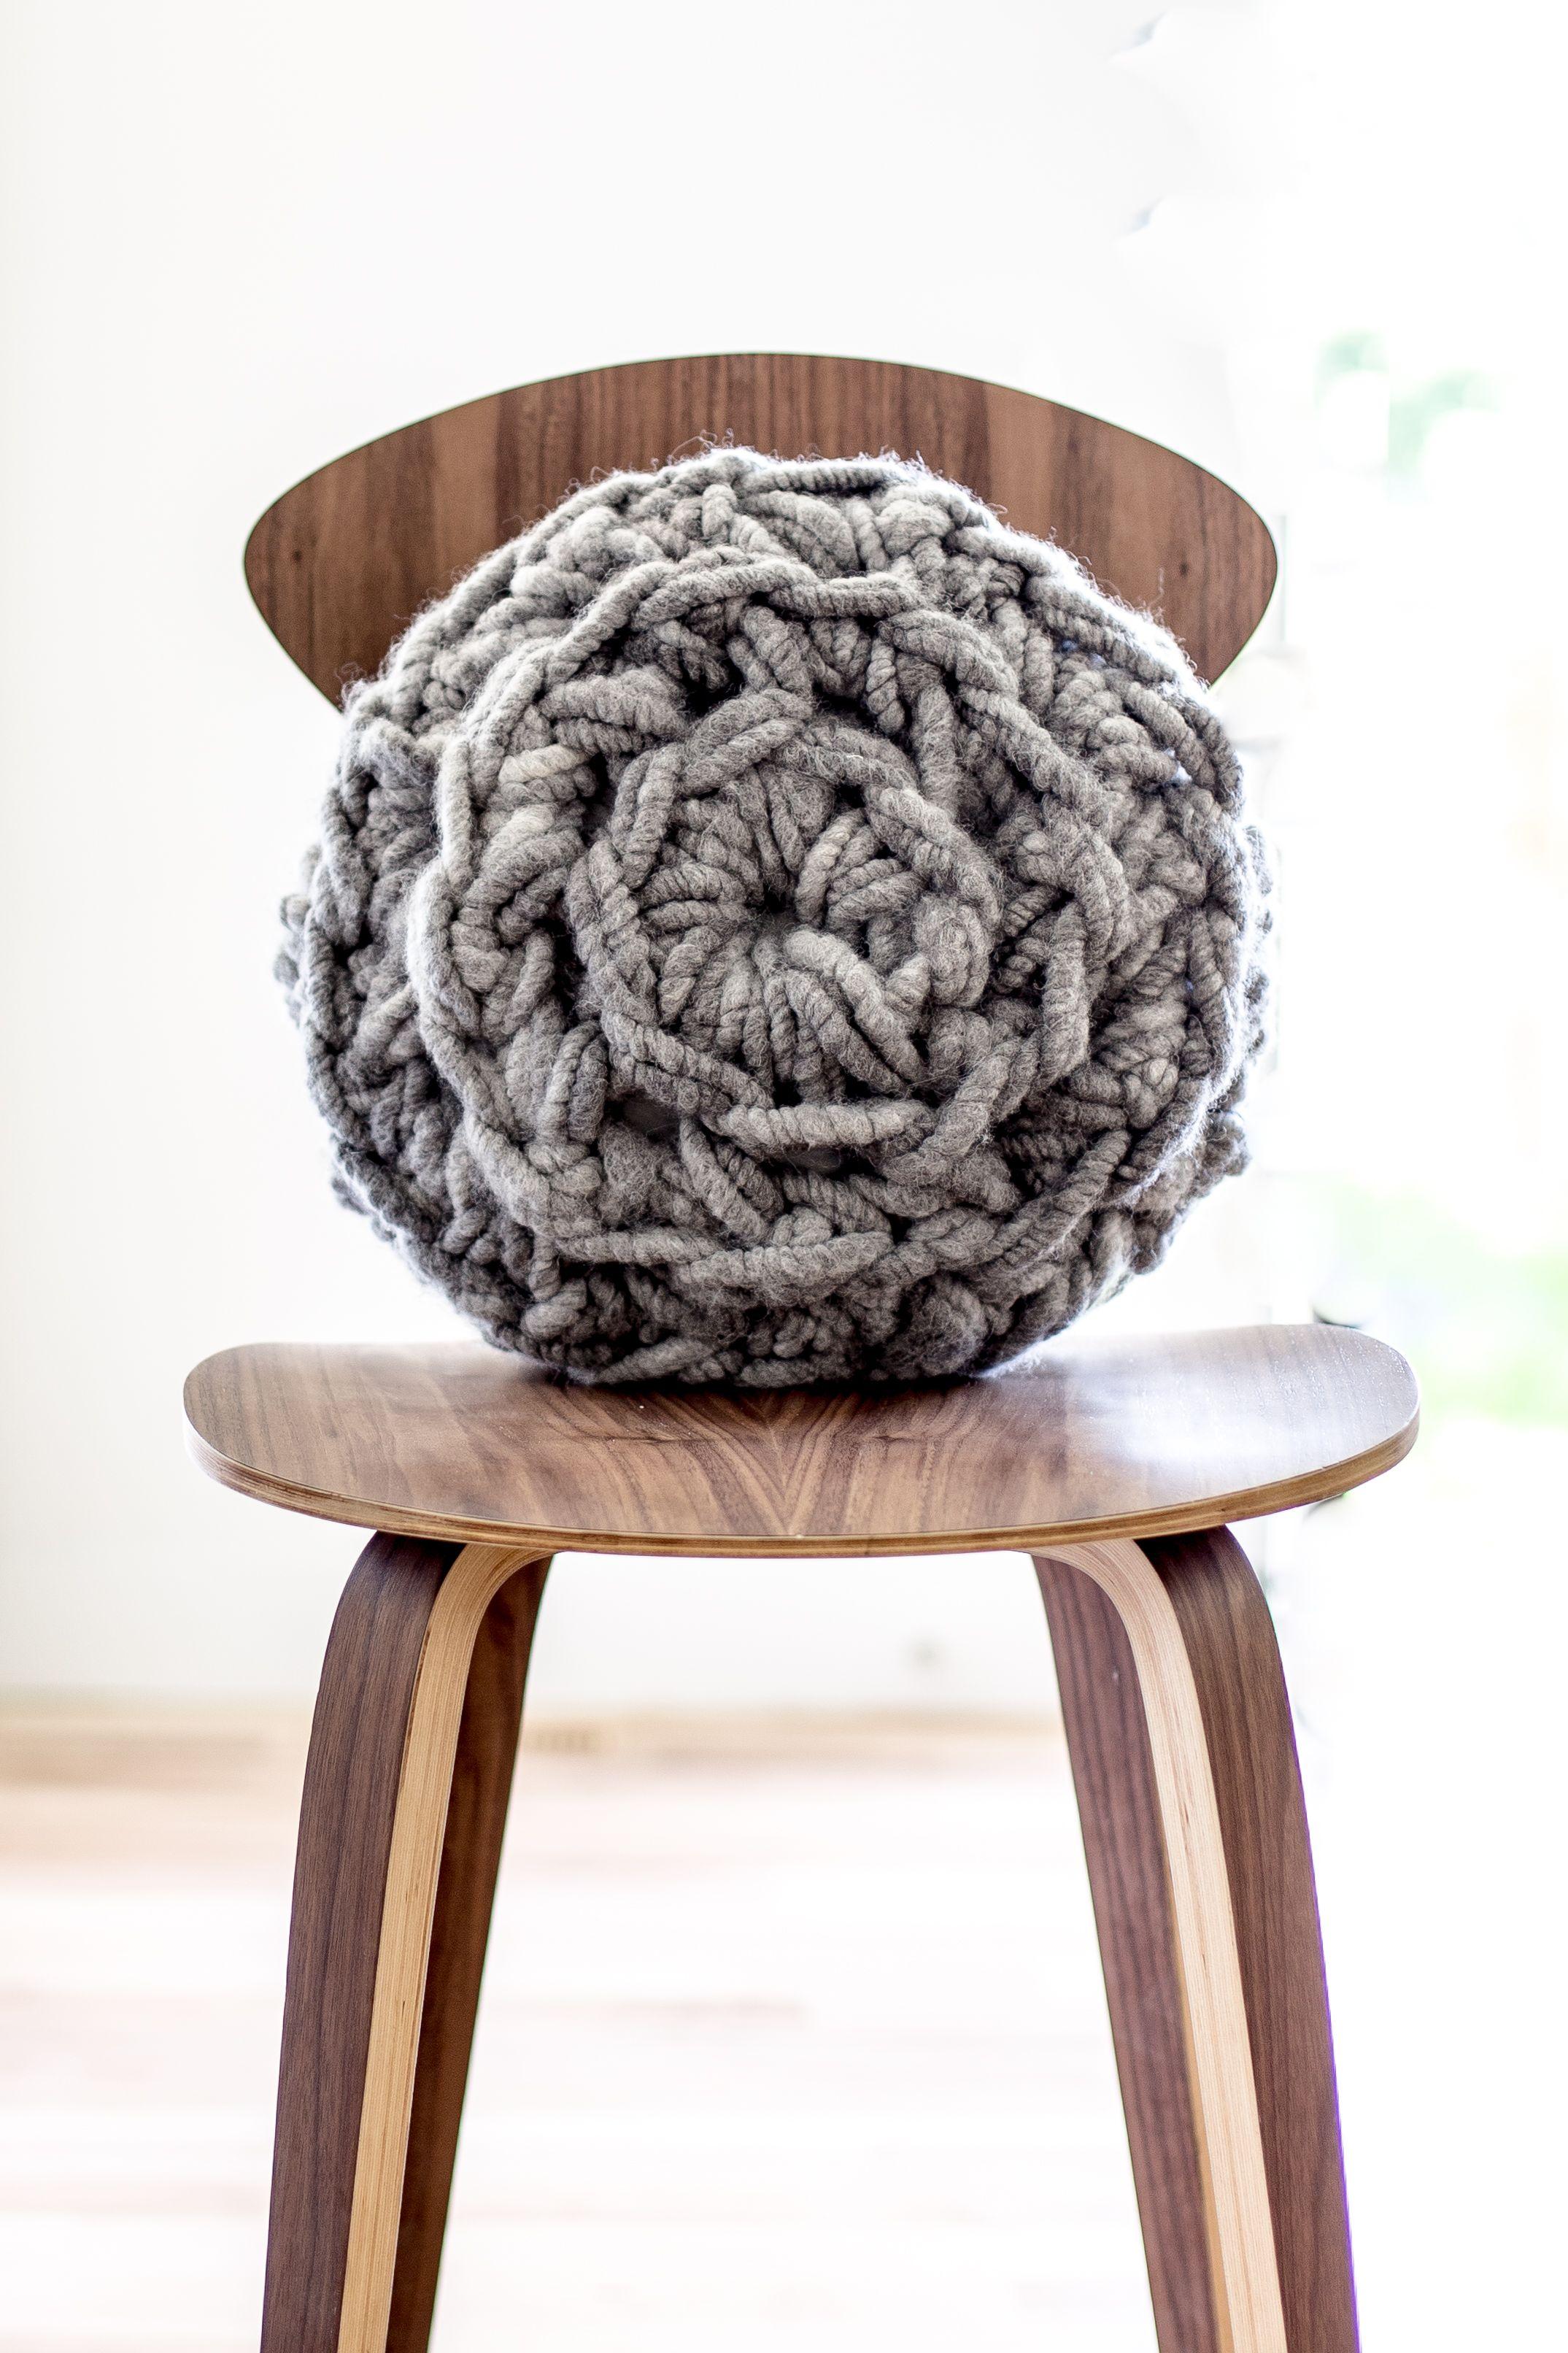 Hand Crochet Round Pillow Pattern - Flax & Twine